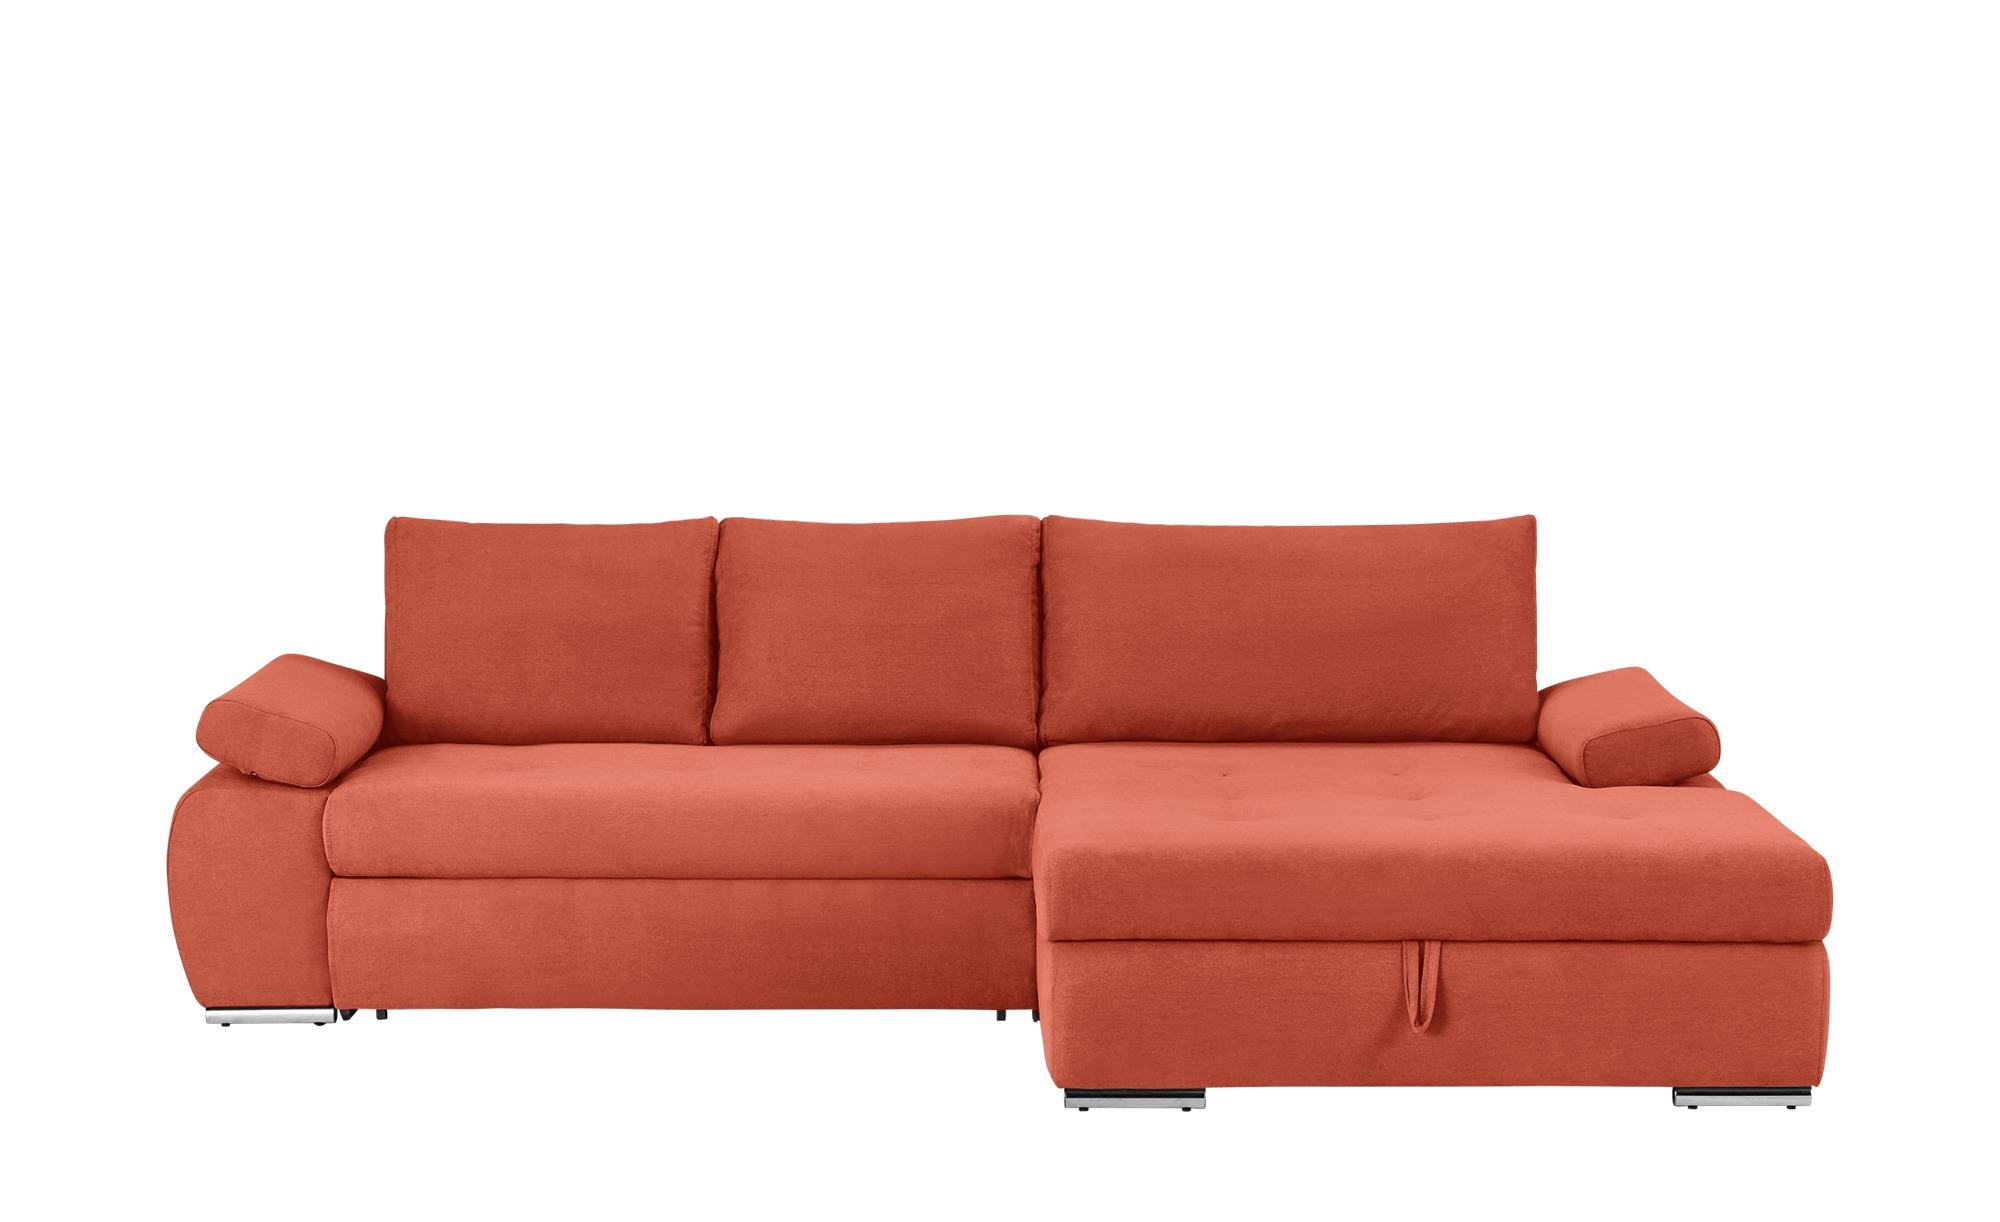 smart Ecksofa  Ibby ¦ orange ¦ Maße (cm): H: 73 Polstermöbel > Sofas > Ecksofas - Höffner